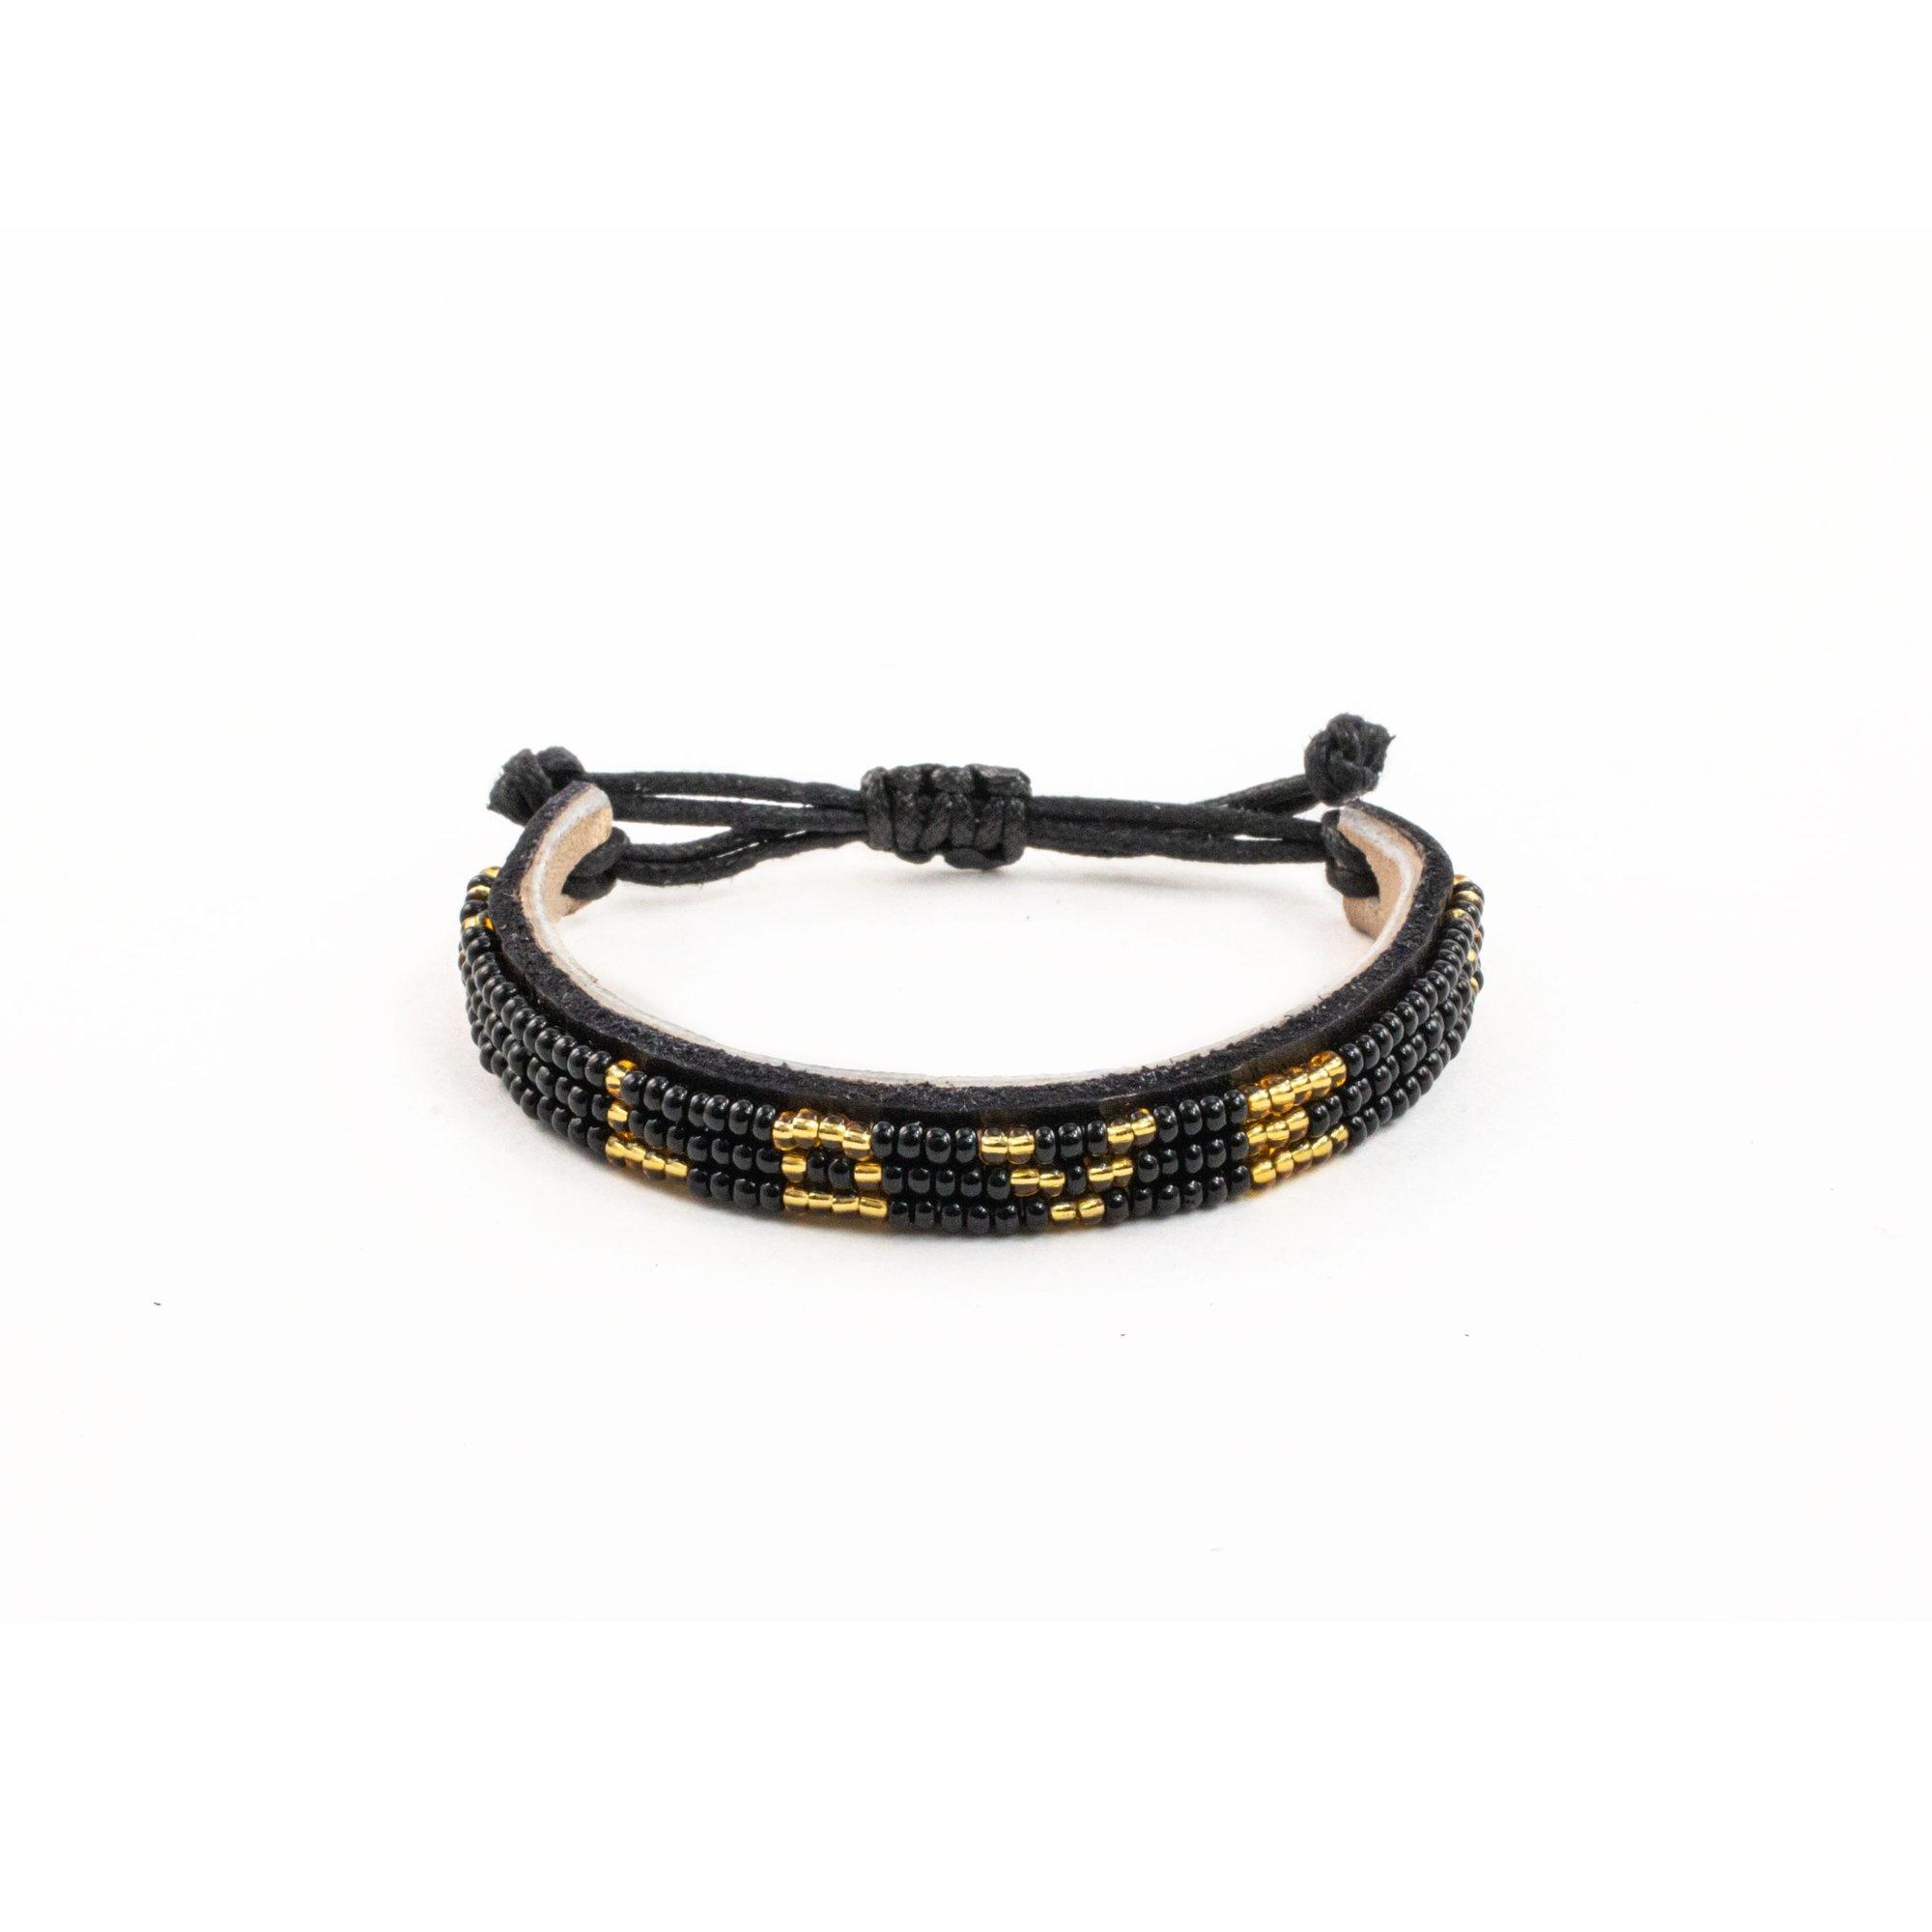 Love Project Skinny LOVE Bracelet - Black/Gold: Small